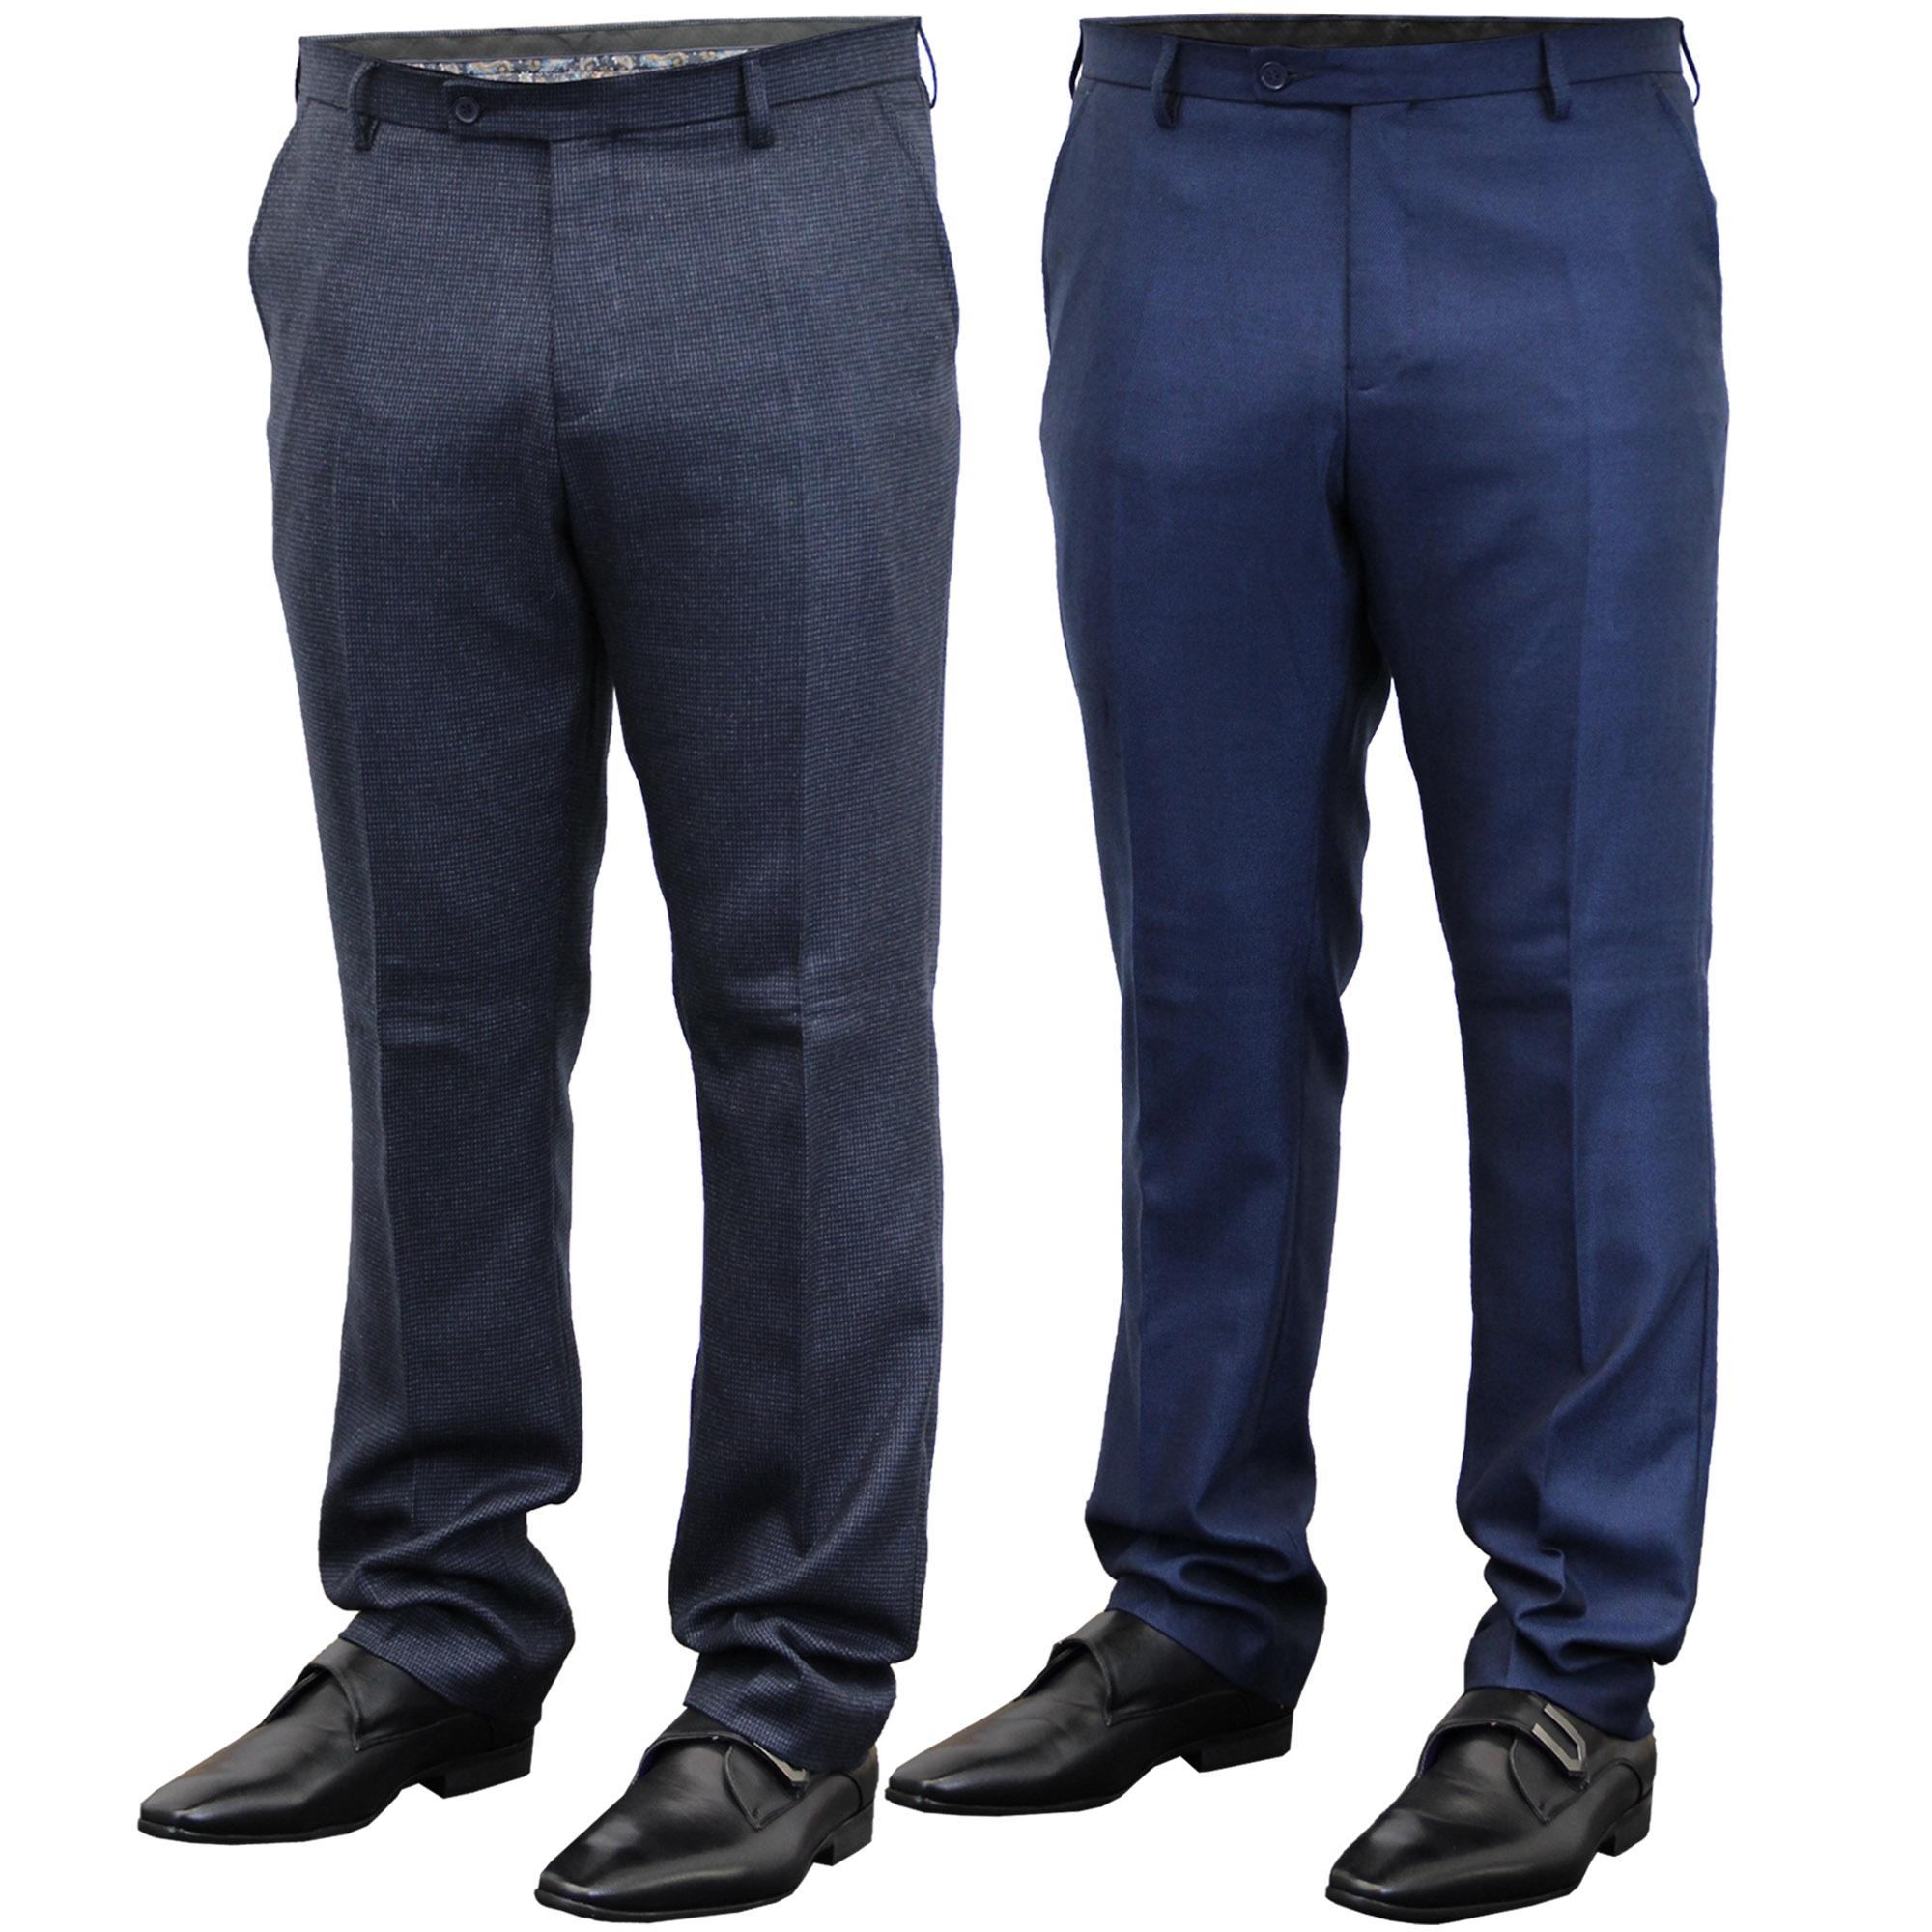 Mens-Trouser-Cavani-Pants-Formal-Wedding-Office-Work-Smart-Fashion-Casual-New thumbnail 6